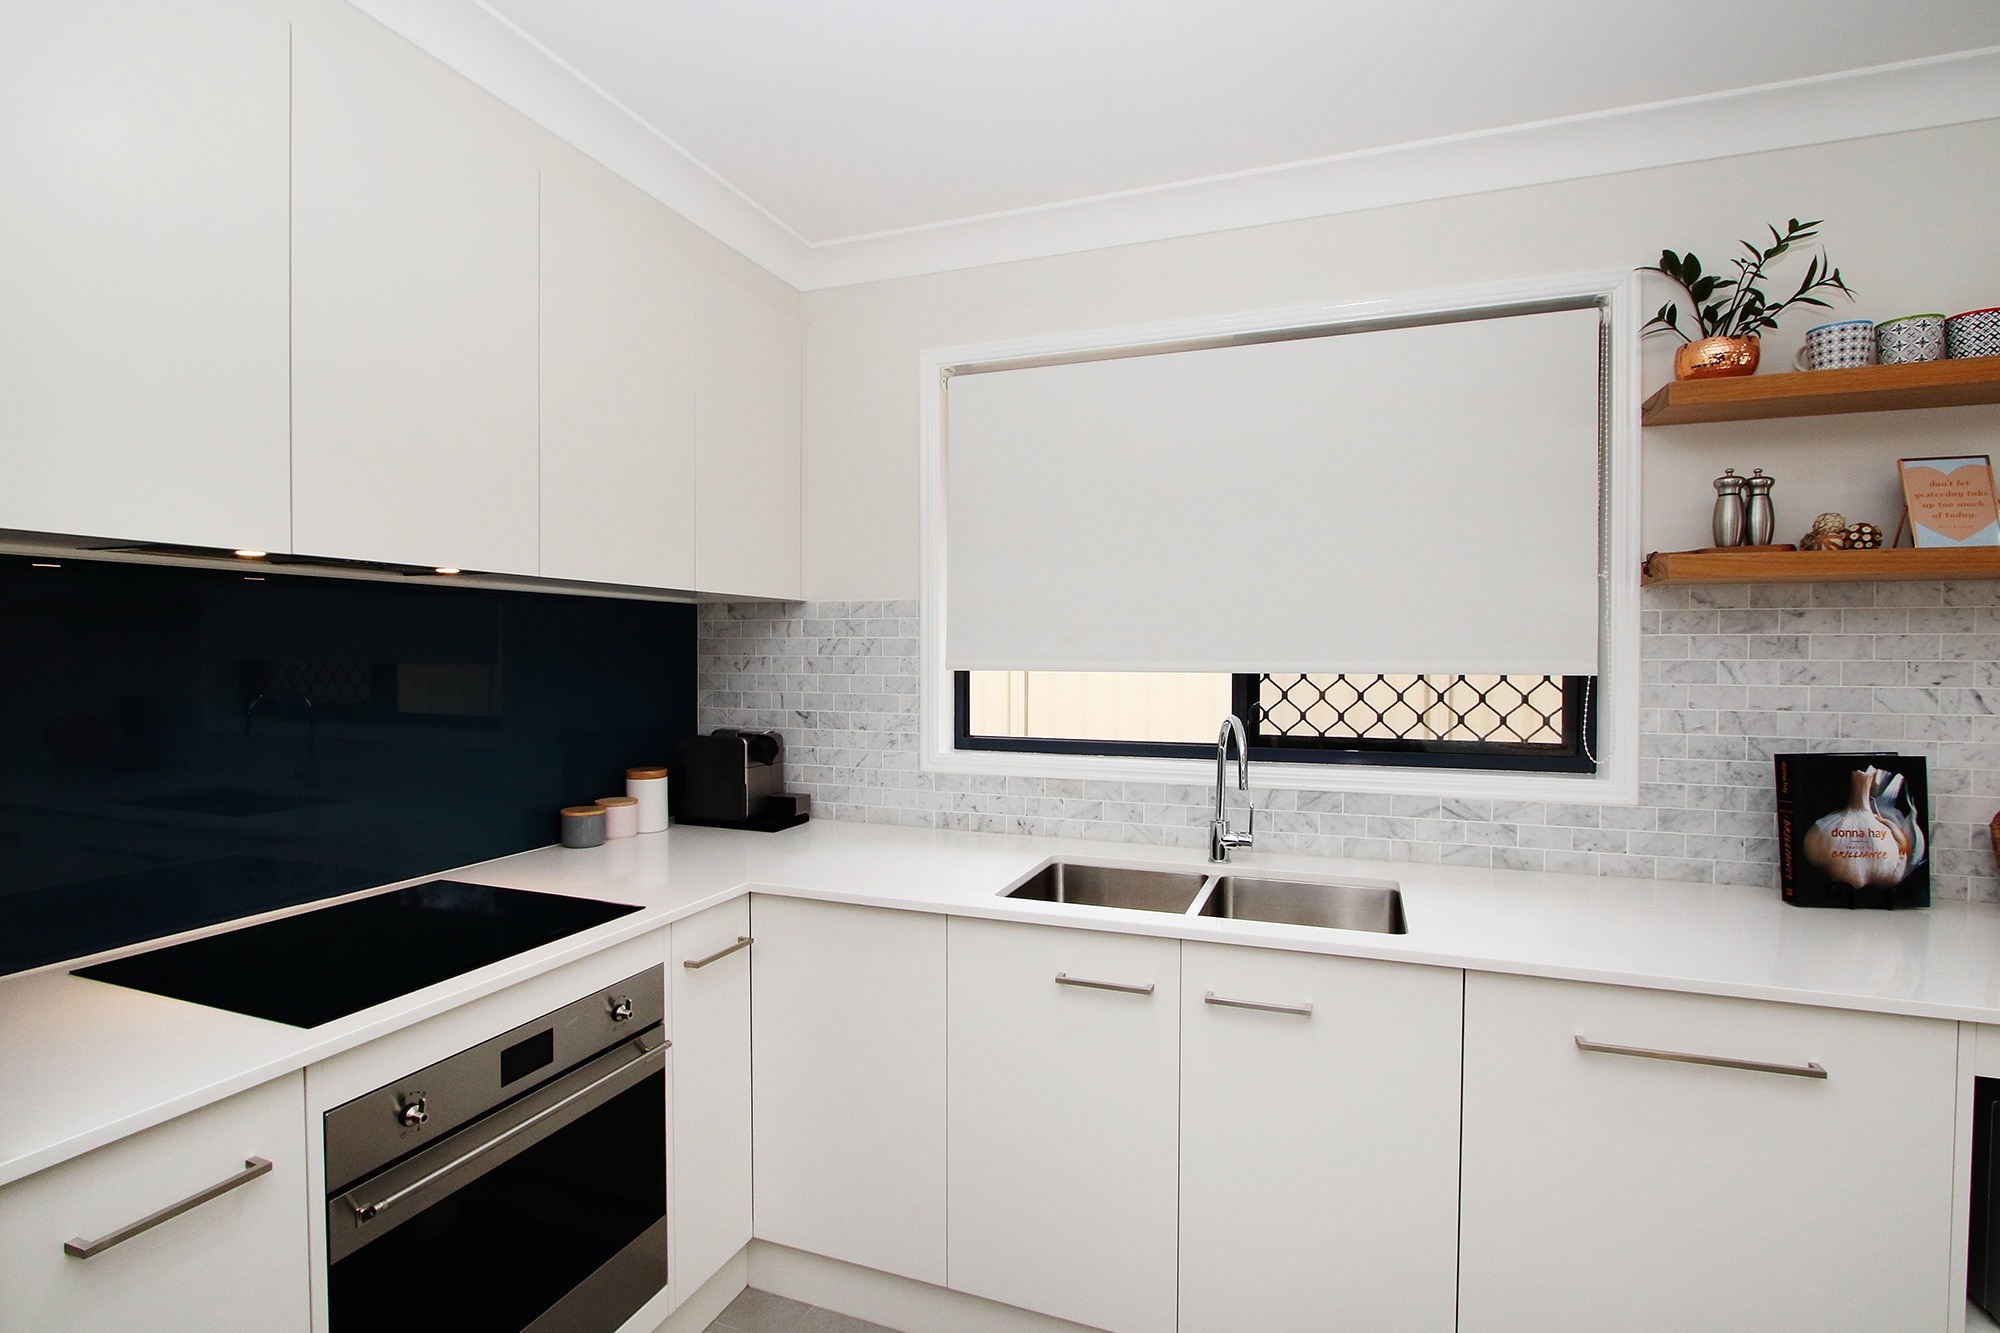 Modern_Style_Kitchen_Cabinets